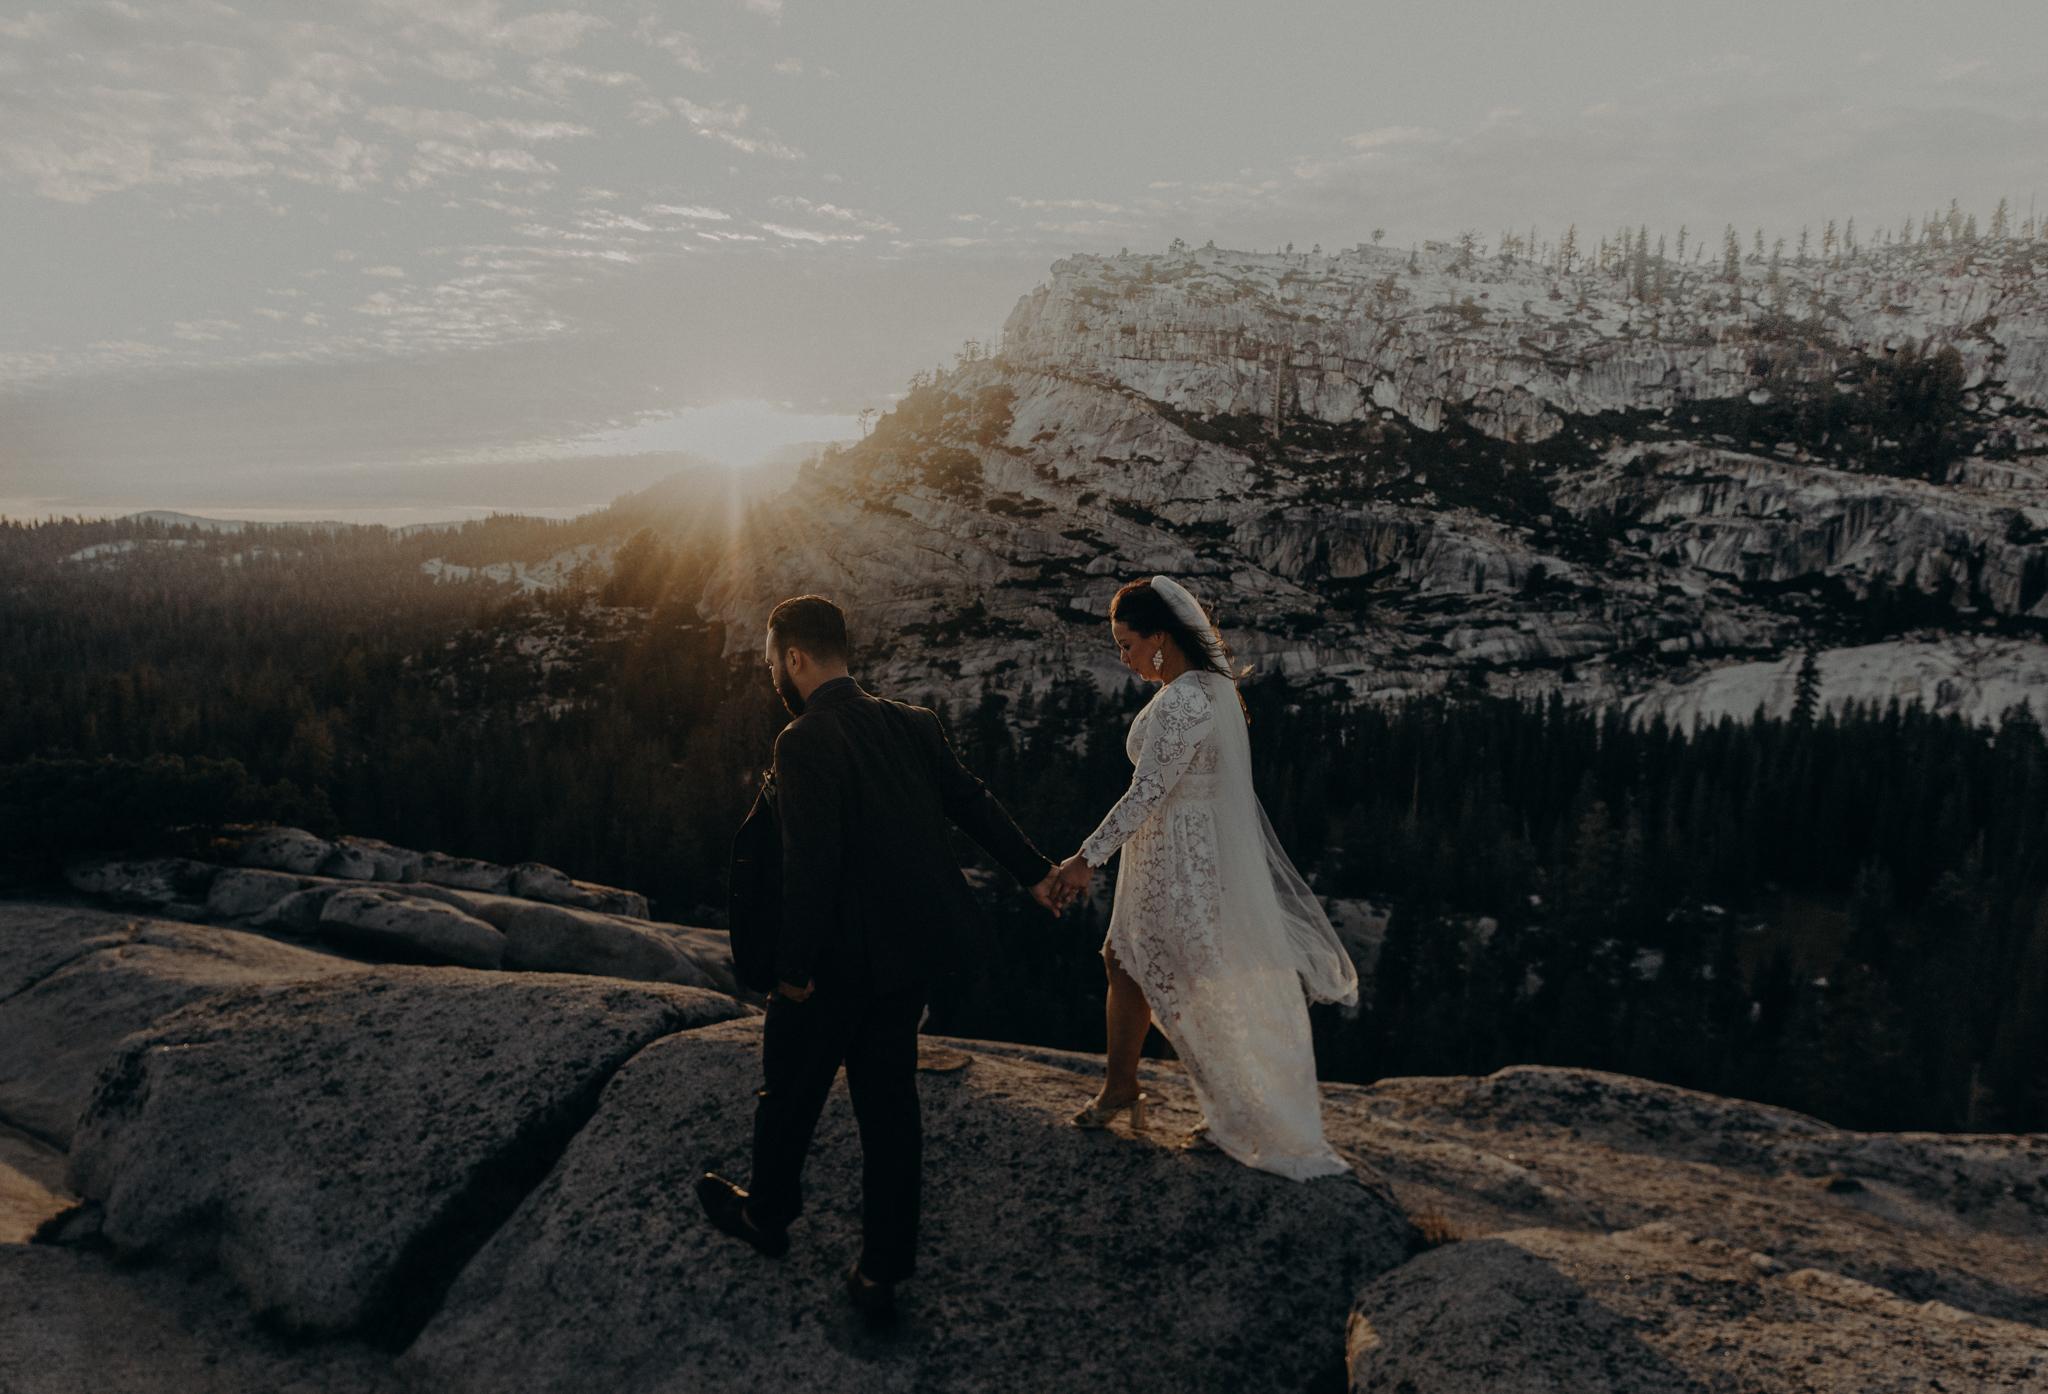 Yosemite Elopement Photographer - Evergreen Lodge Wedding Photographer - IsaiahAndTaylor.com-049.jpg